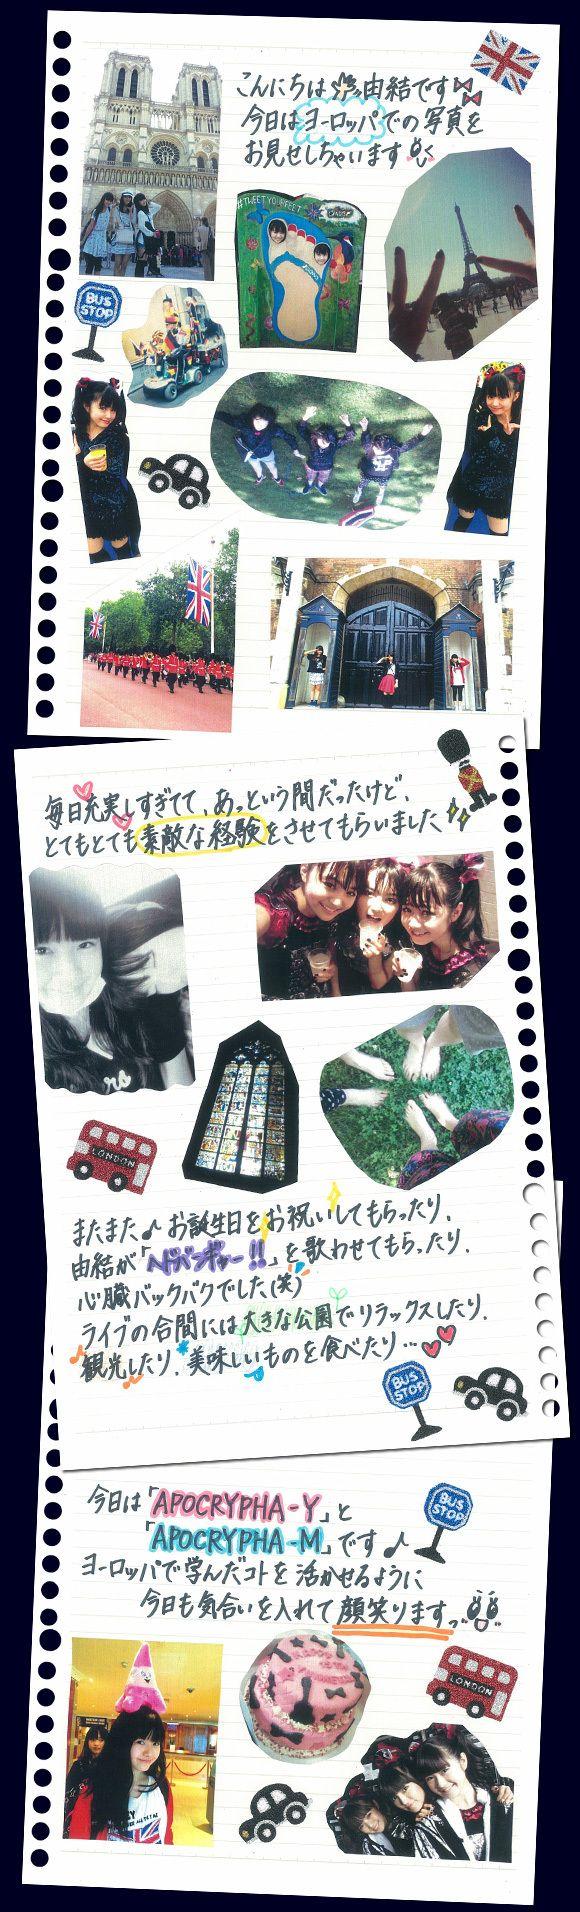 YUI-METAL❤ さくら学院オフィシャルブログ「学院日誌」Powered by Ameba